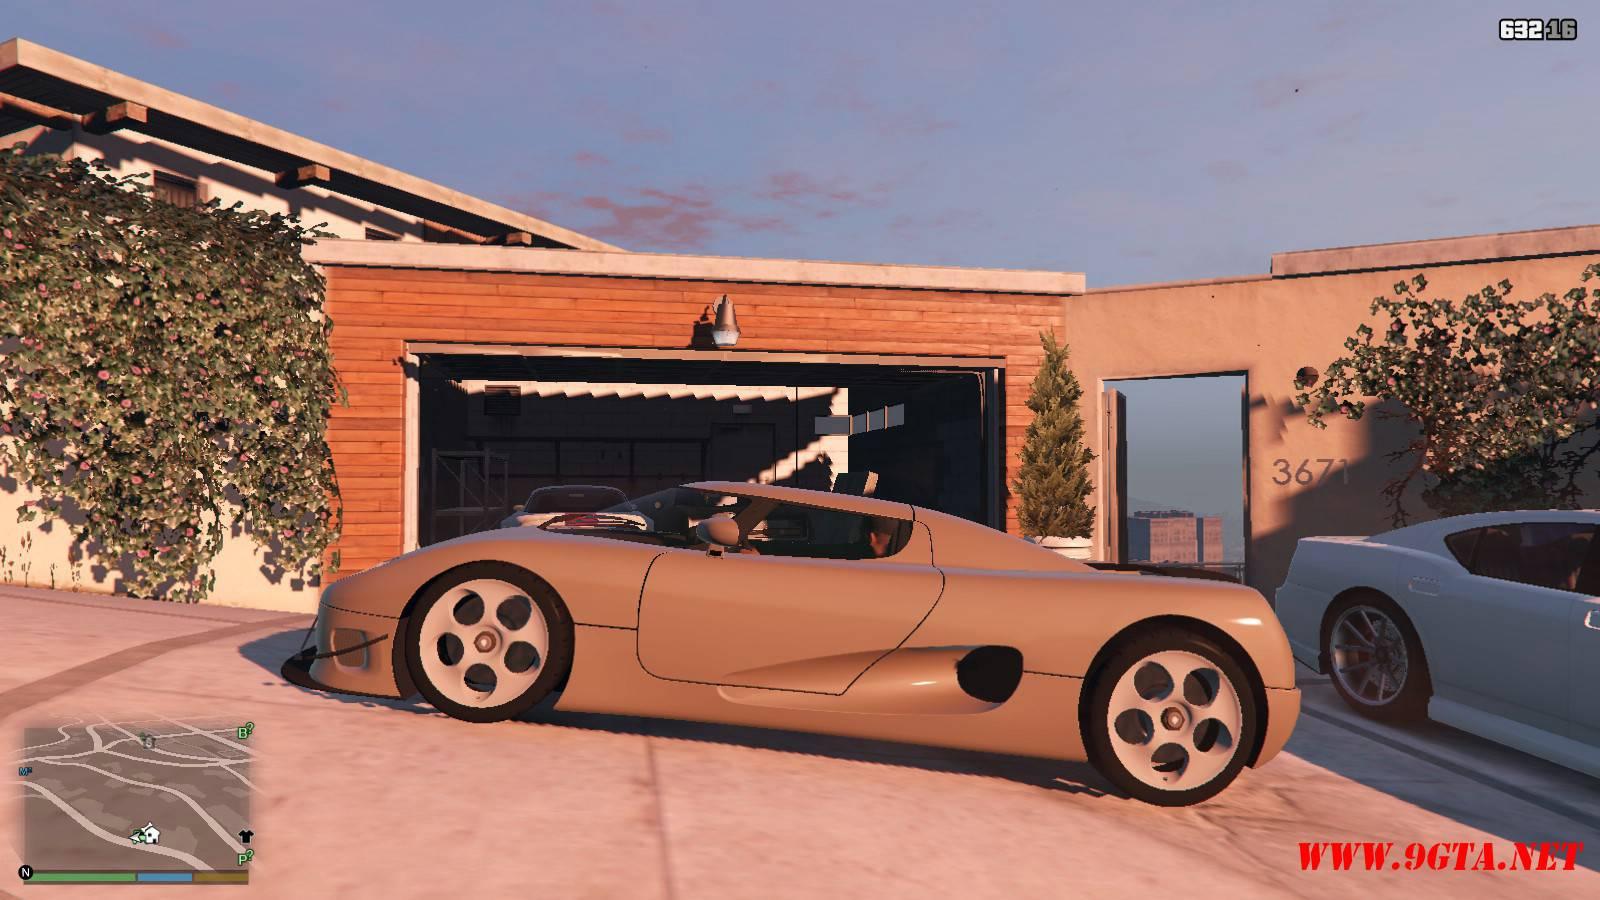 2002 Koenigsegg CC8S GTA5 Mods (2)